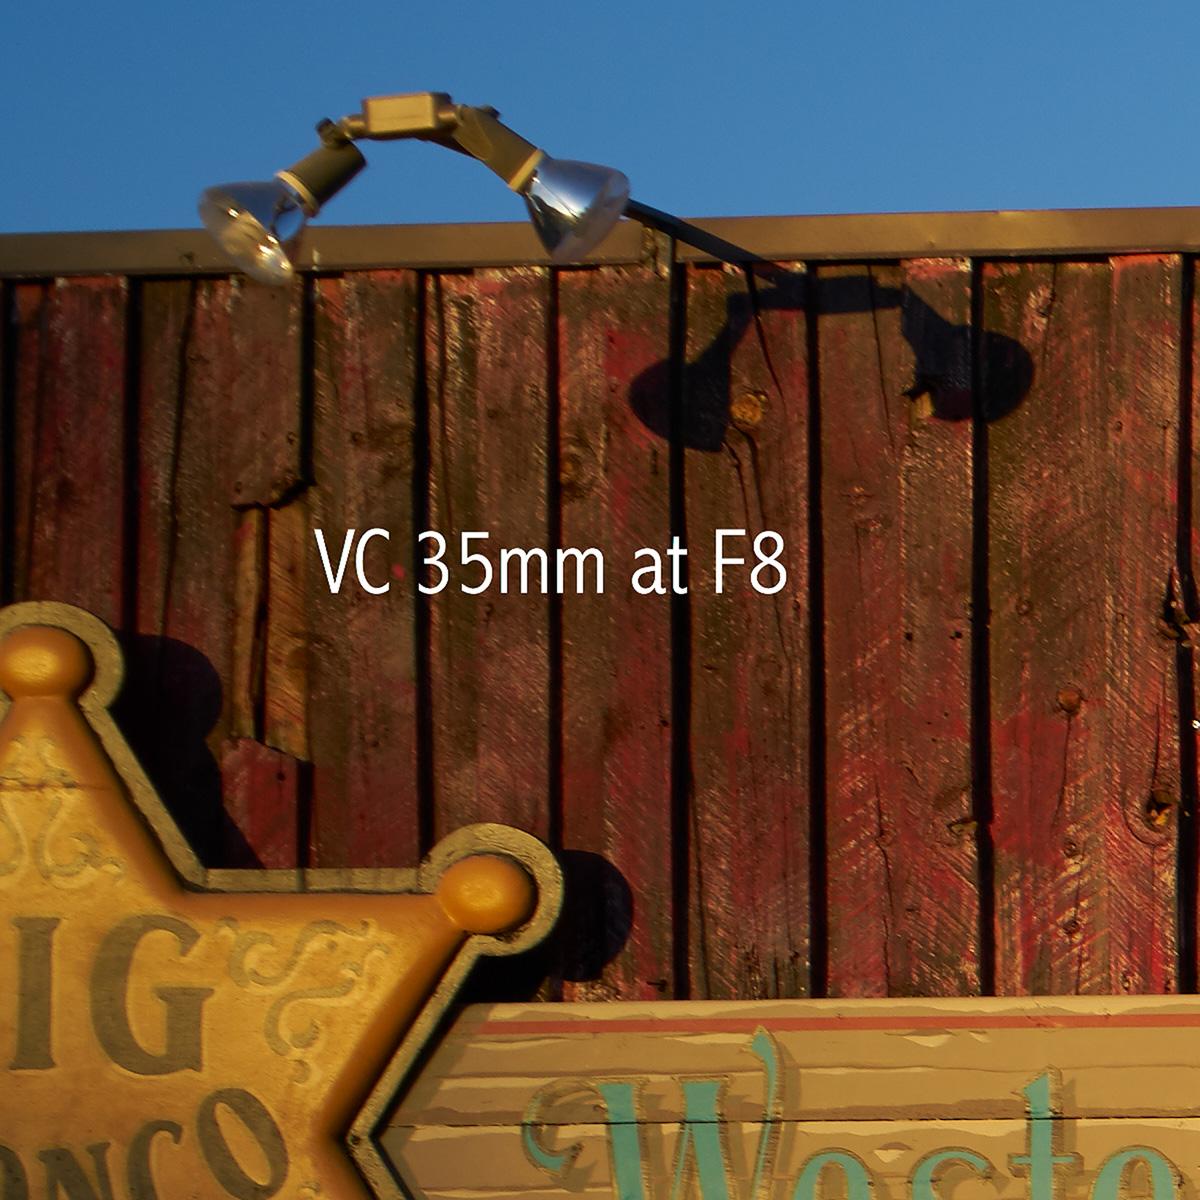 vc f8 by Guy Mancuso in Guy Mancuso